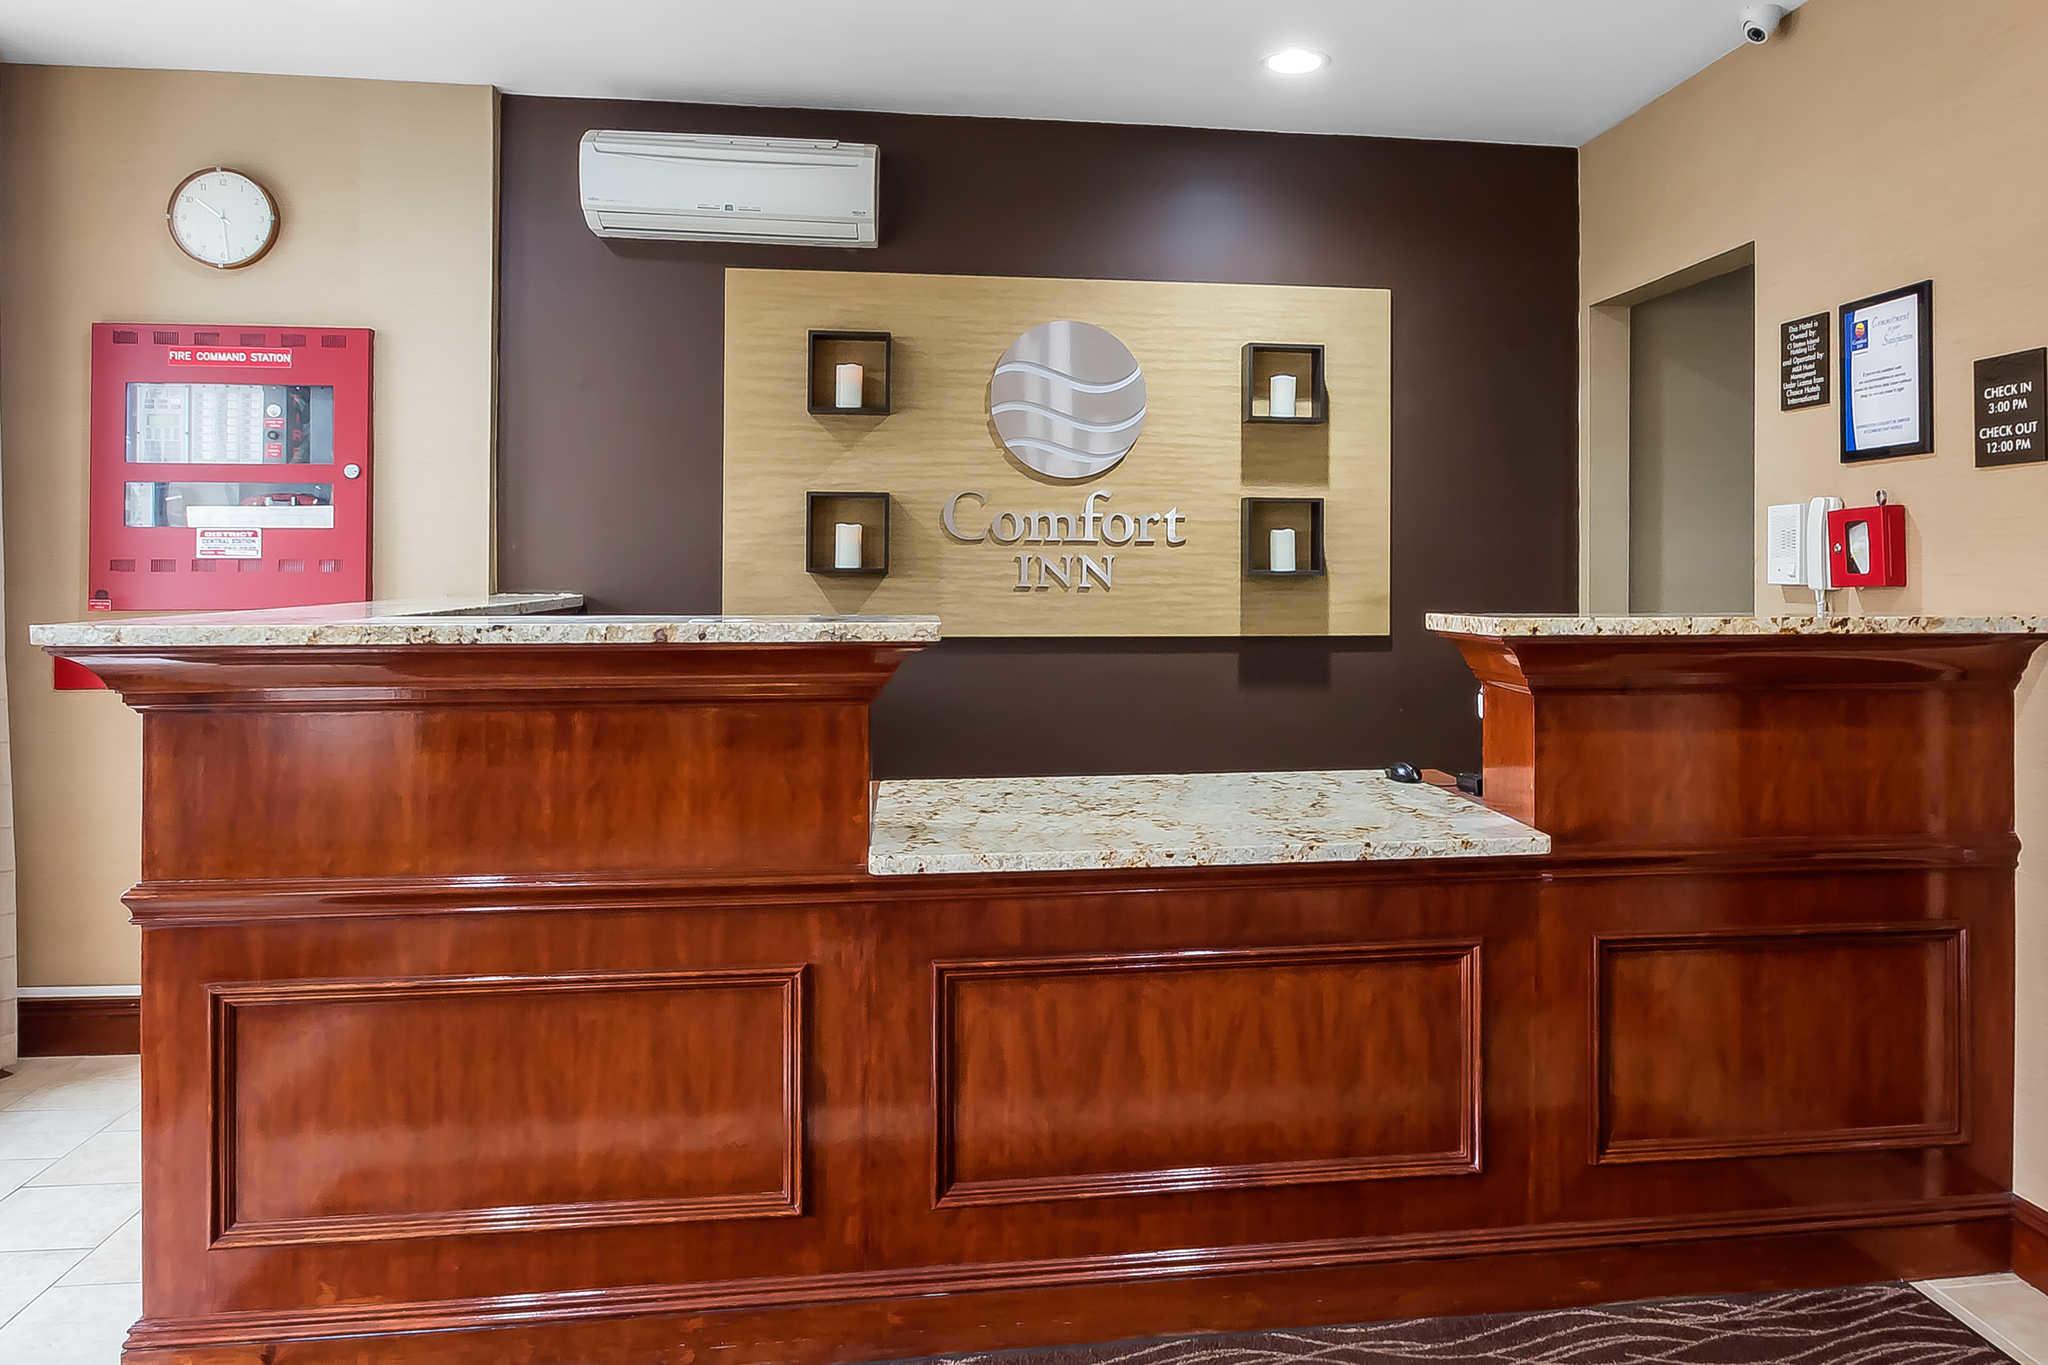 Comfort Inn Staten Island image 13